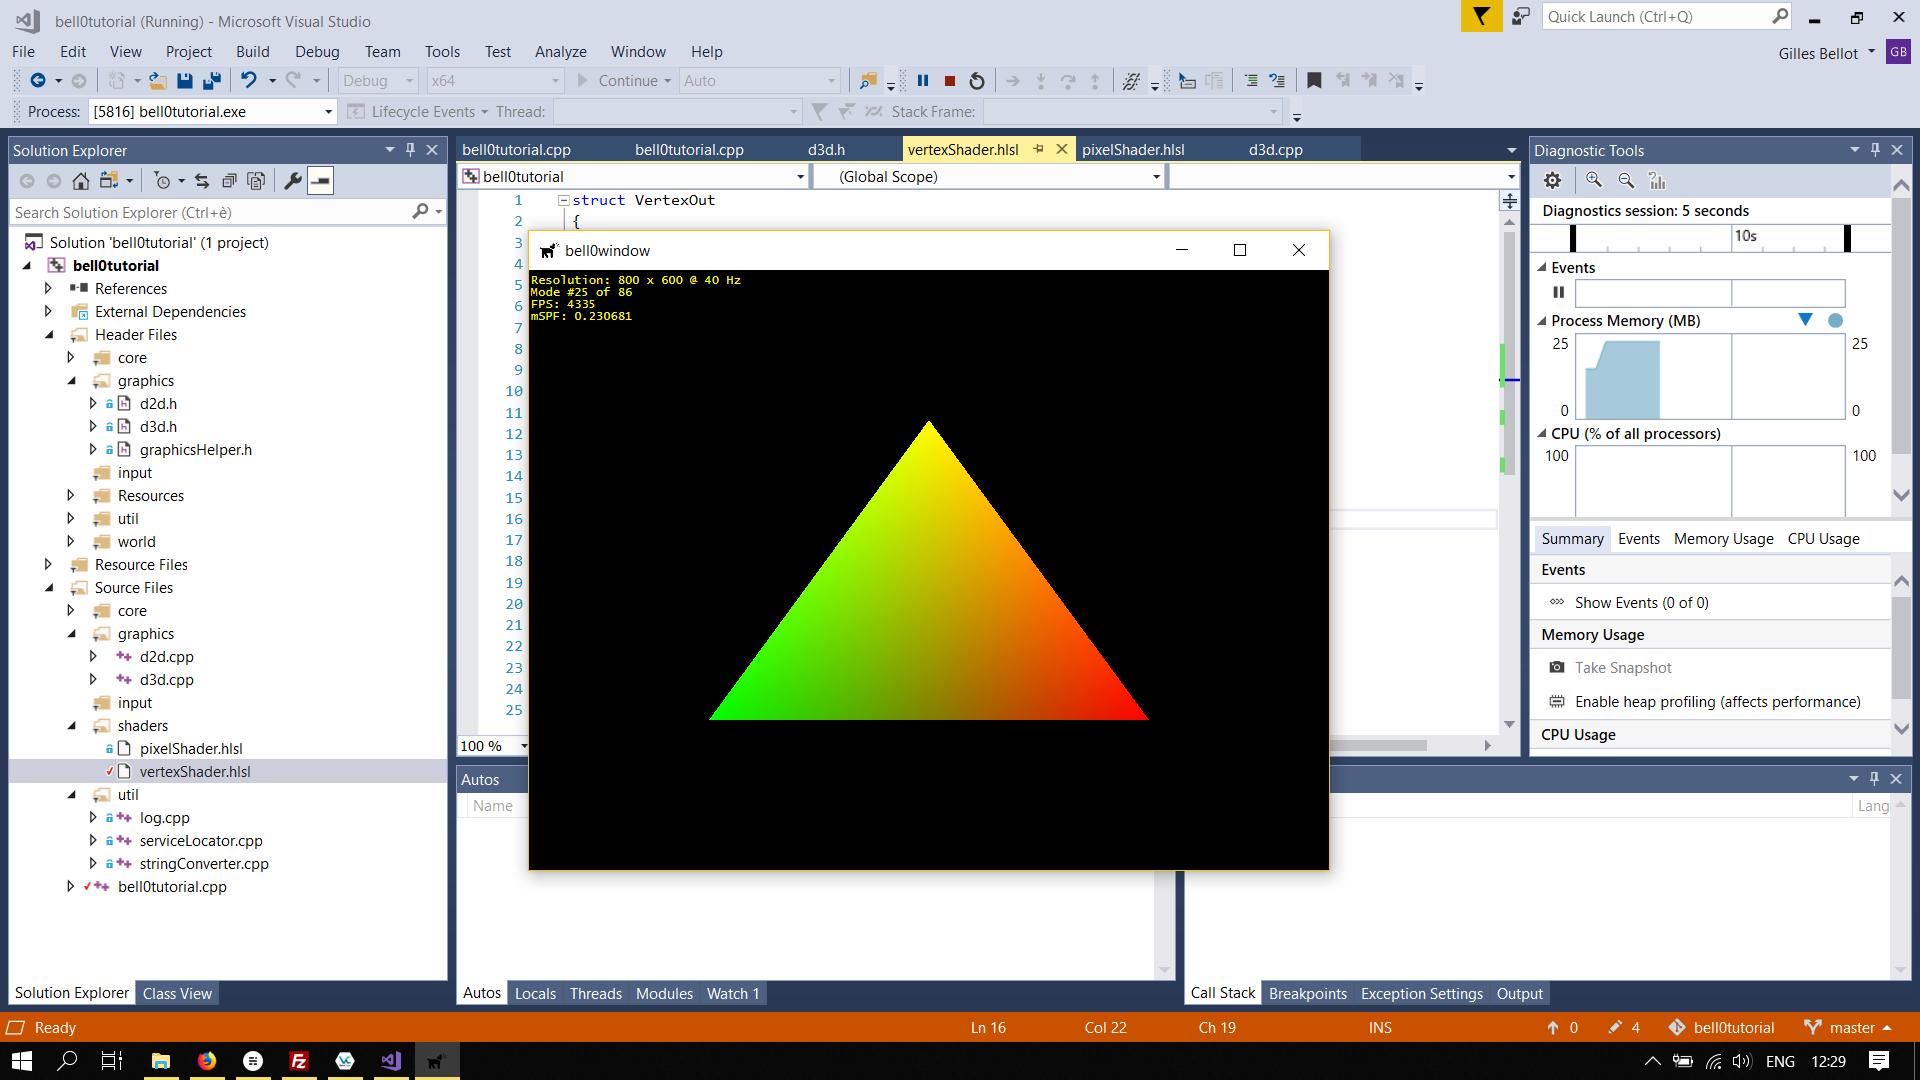 Scaled Triangle